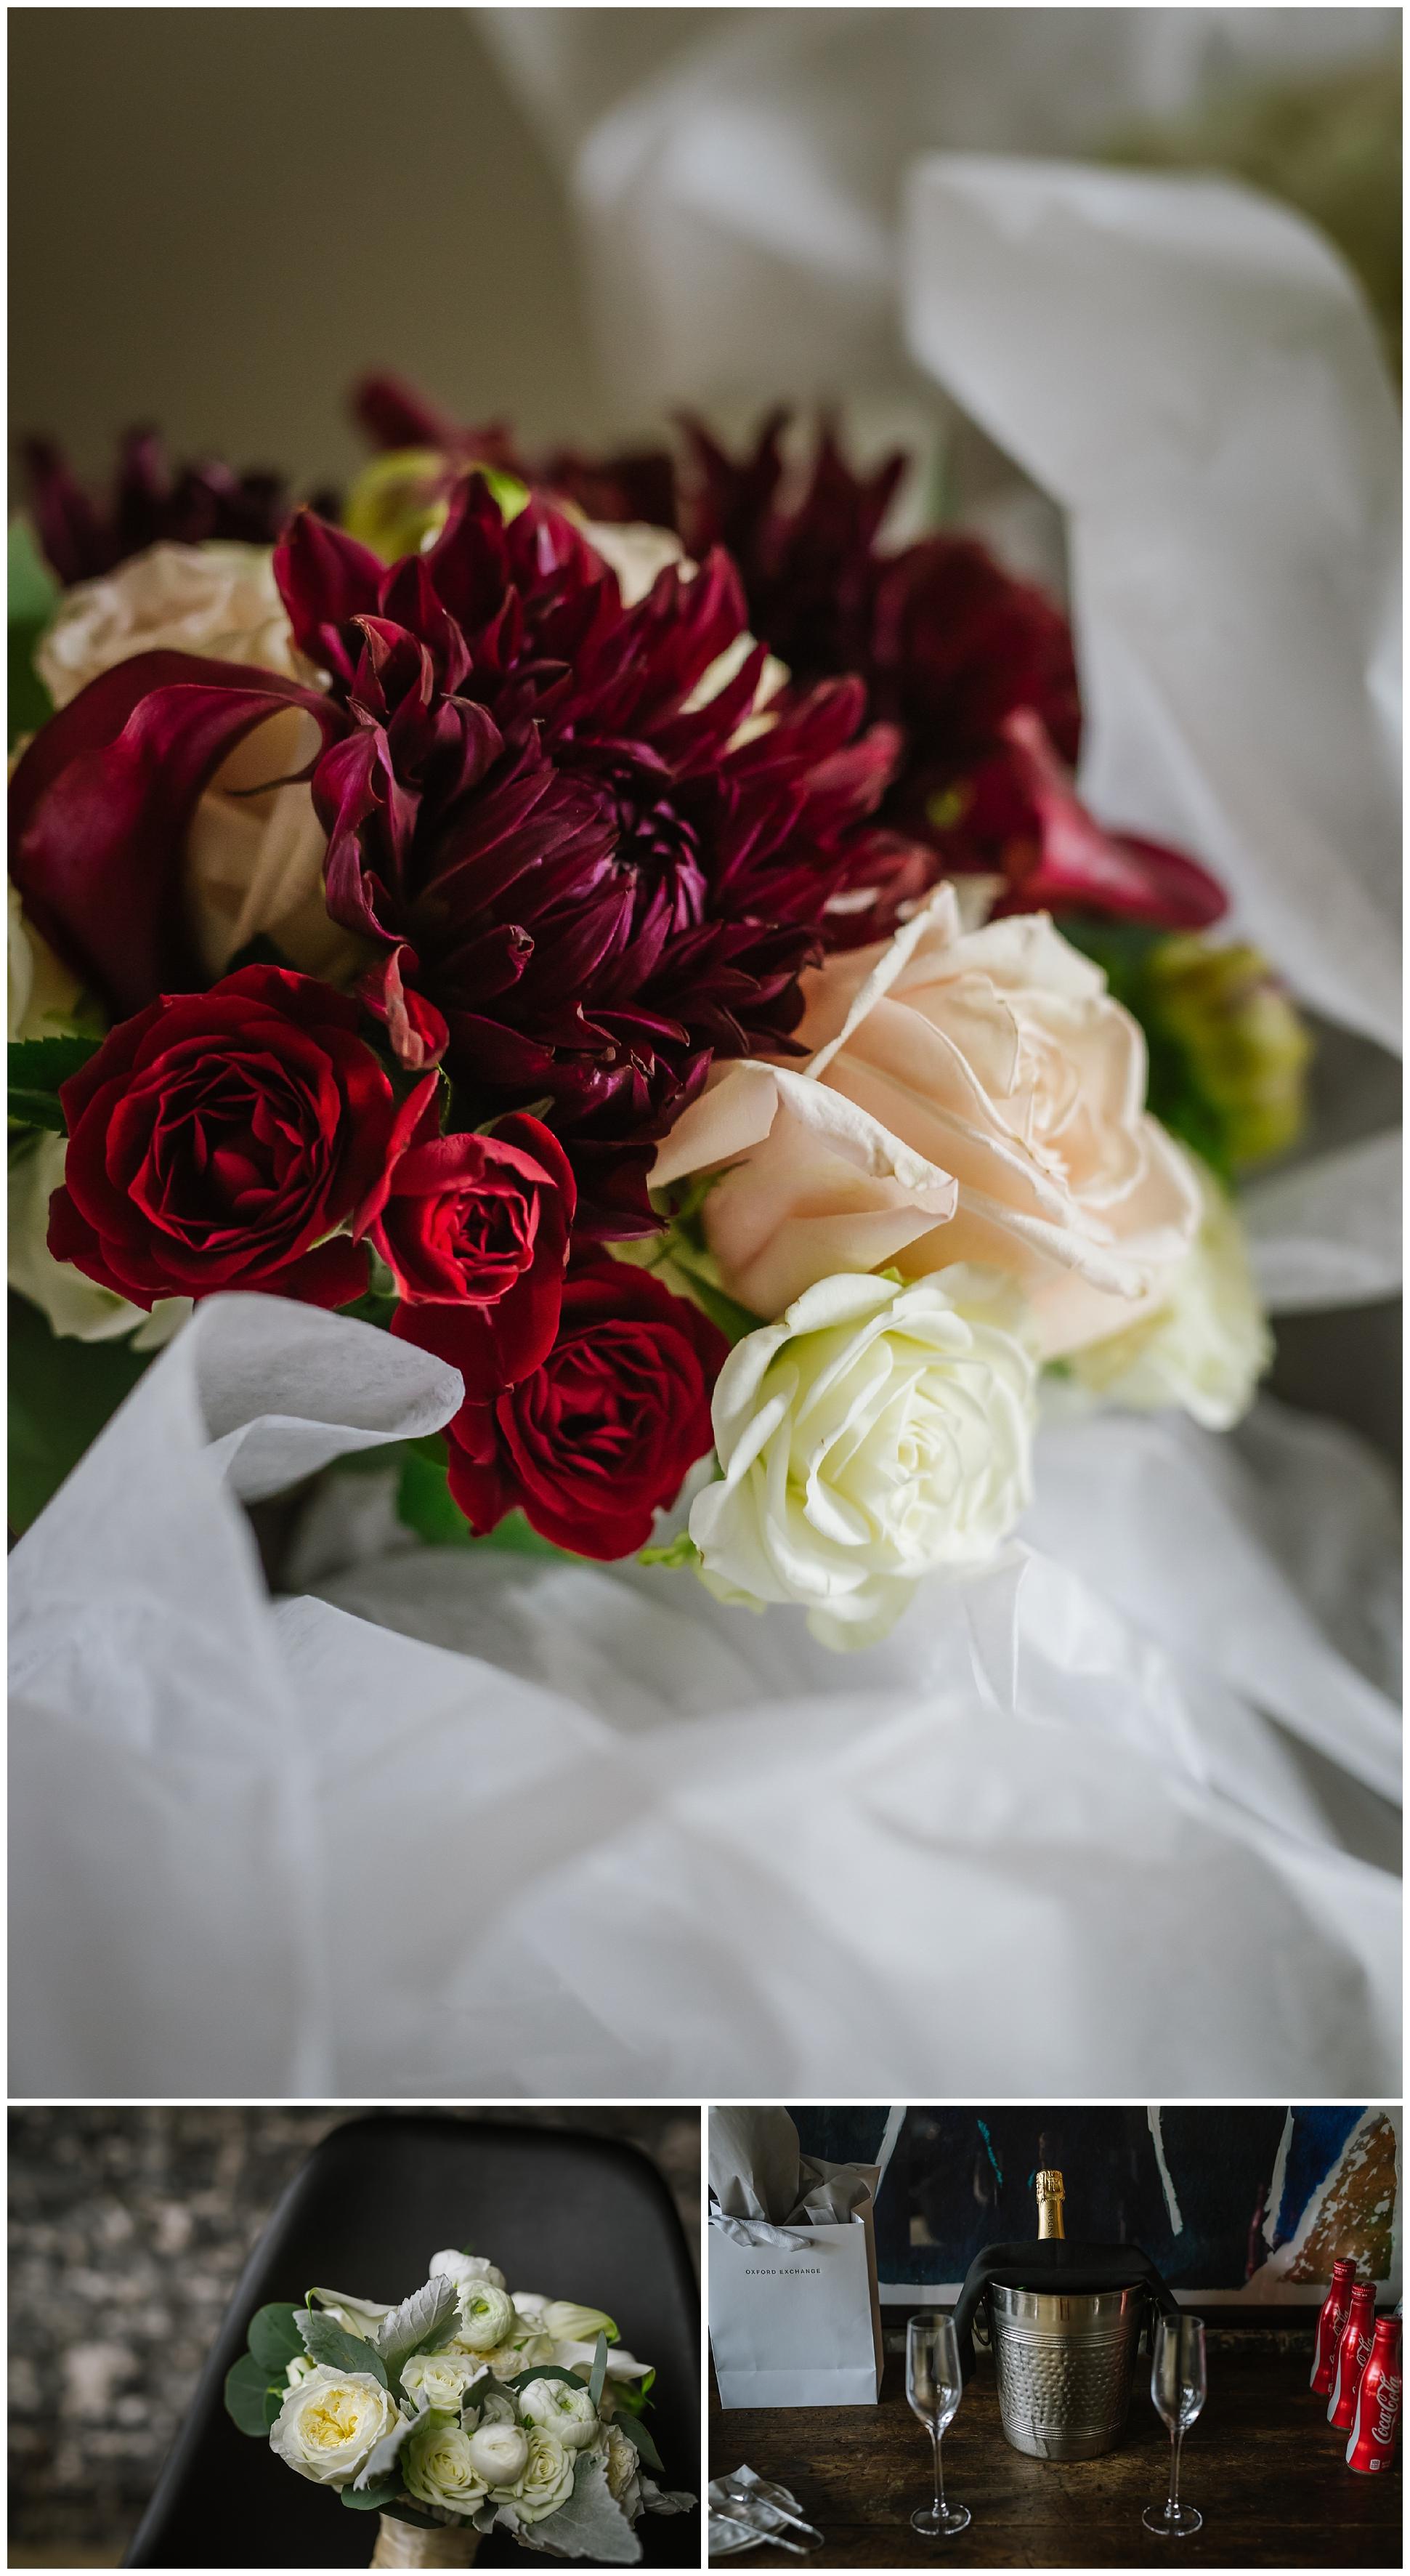 Oxford-exchange-wedding-photogapher-garland-candels-bookstore-burgandy-botanica_0002.jpg